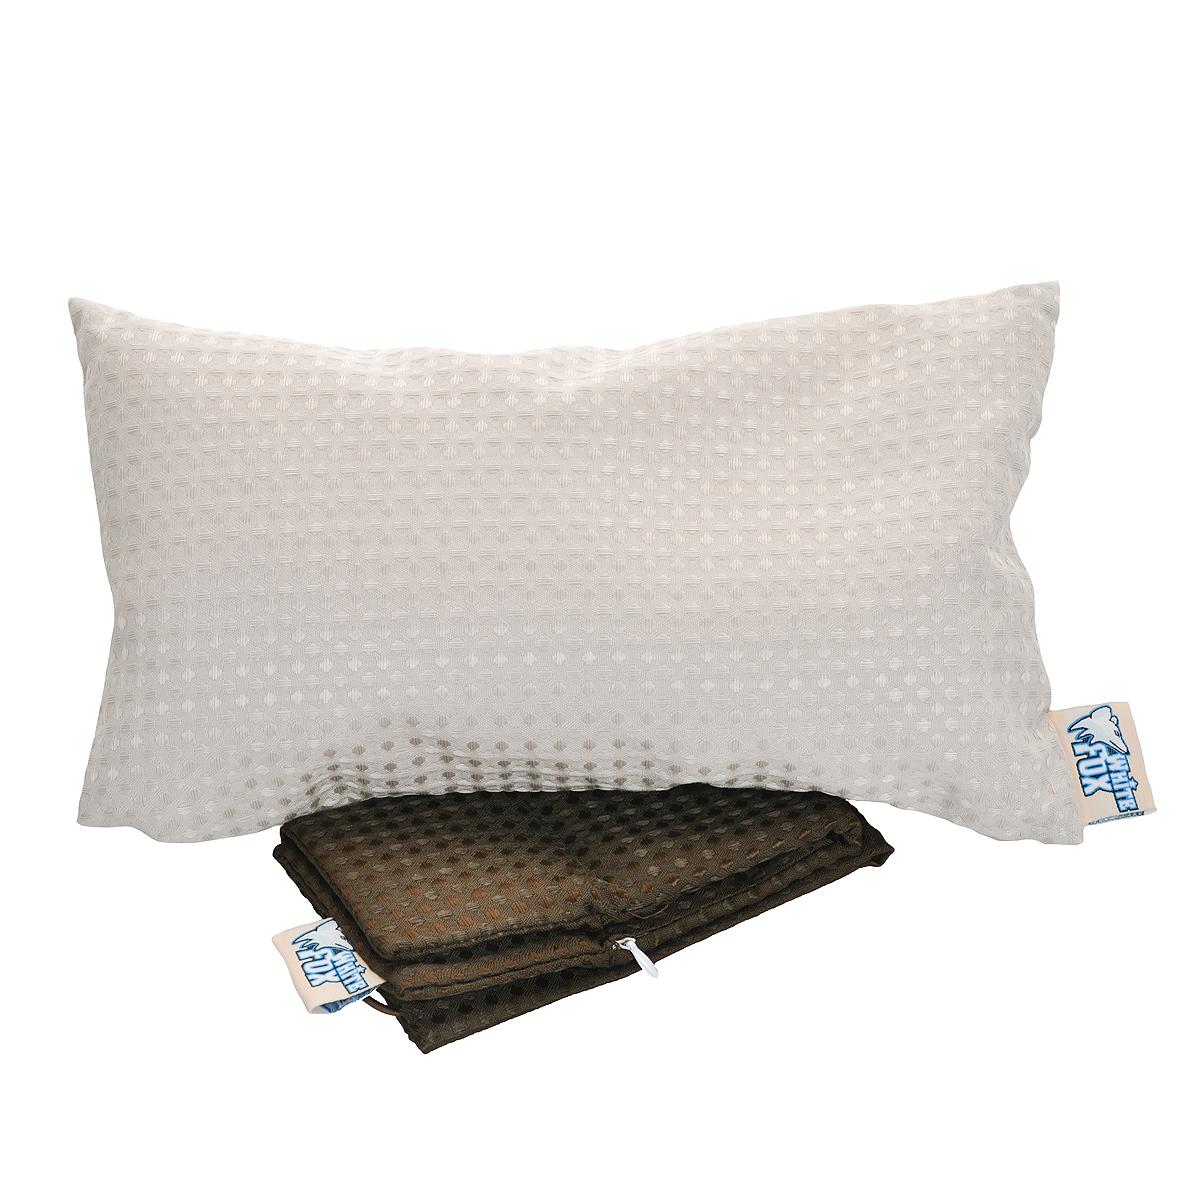 Подушка для ванны White Fox, цвет: бежевый, коричневый, 33 х 20 смWBPW48-120